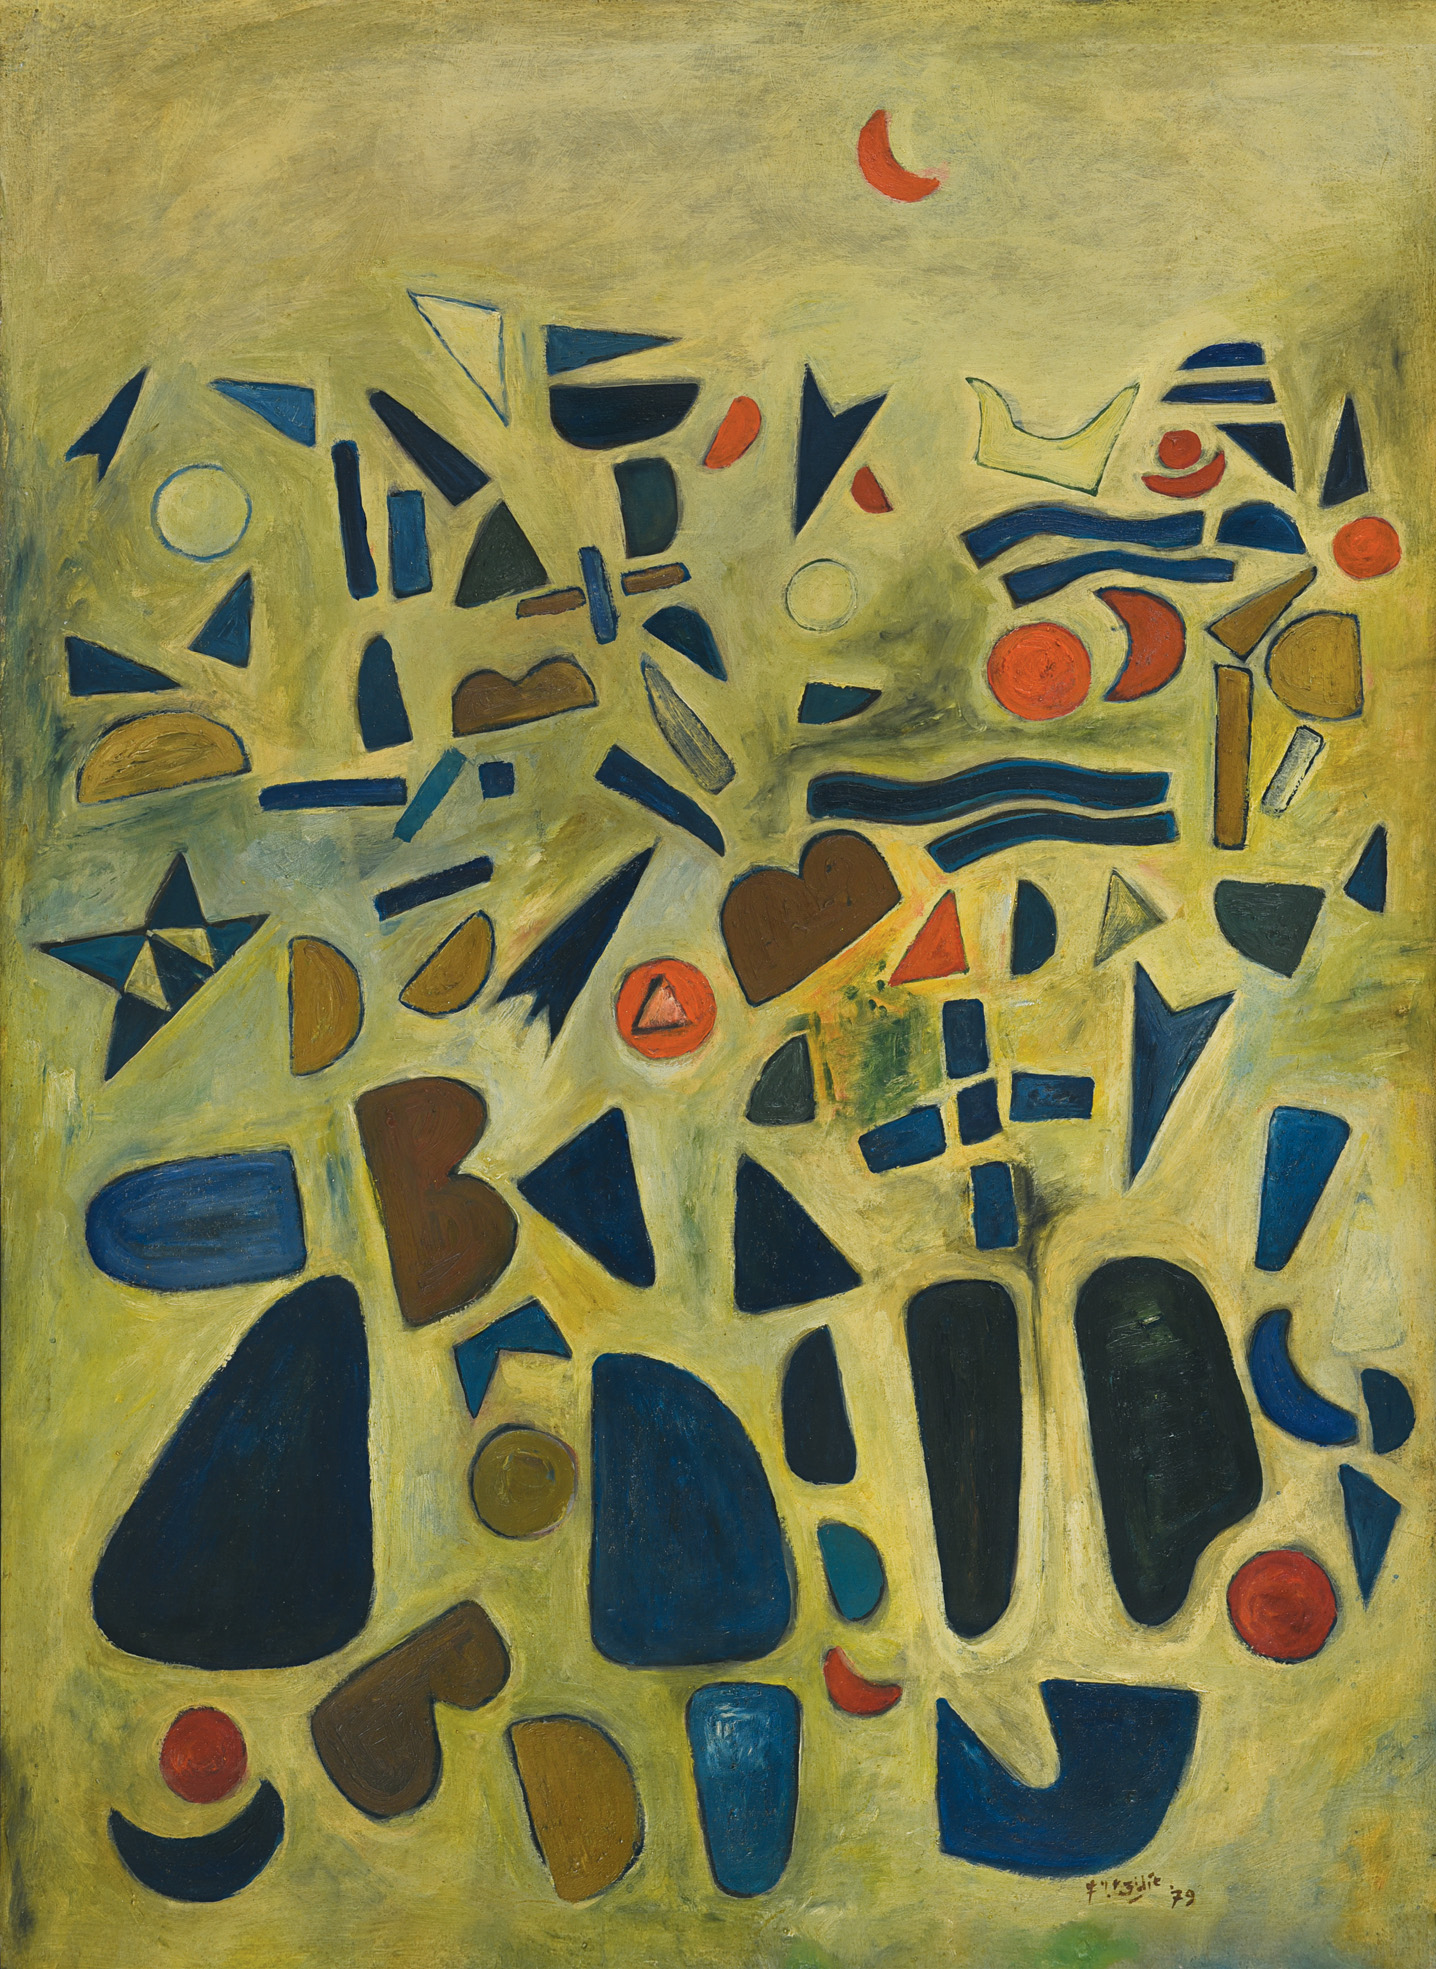 Fadjar Sidik, Untitled, oil on canvas, 115 x 84 cm, 1979